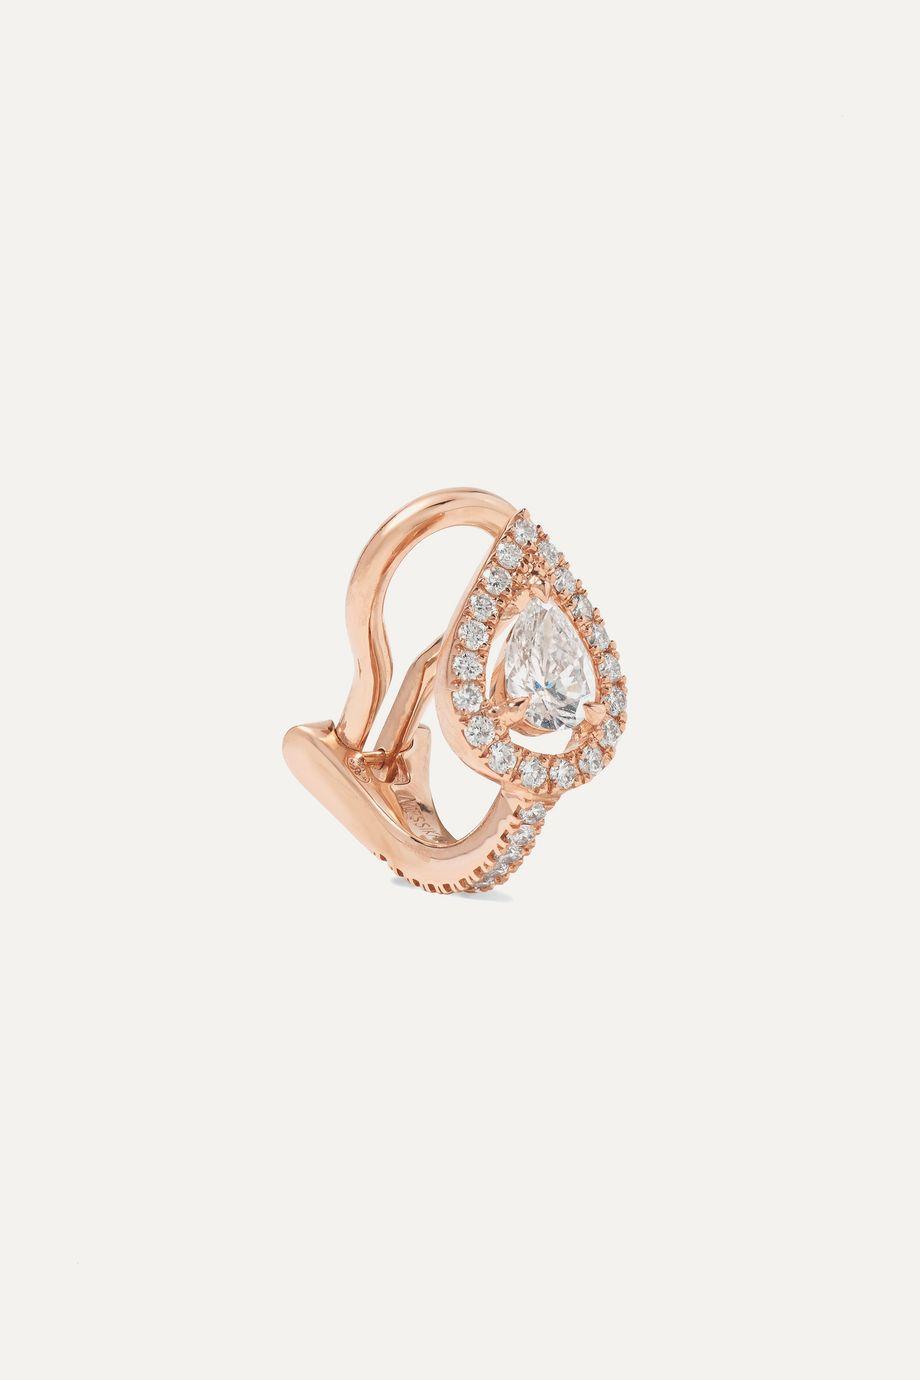 Messika My Twin 18-karat rose gold diamond ear cuff